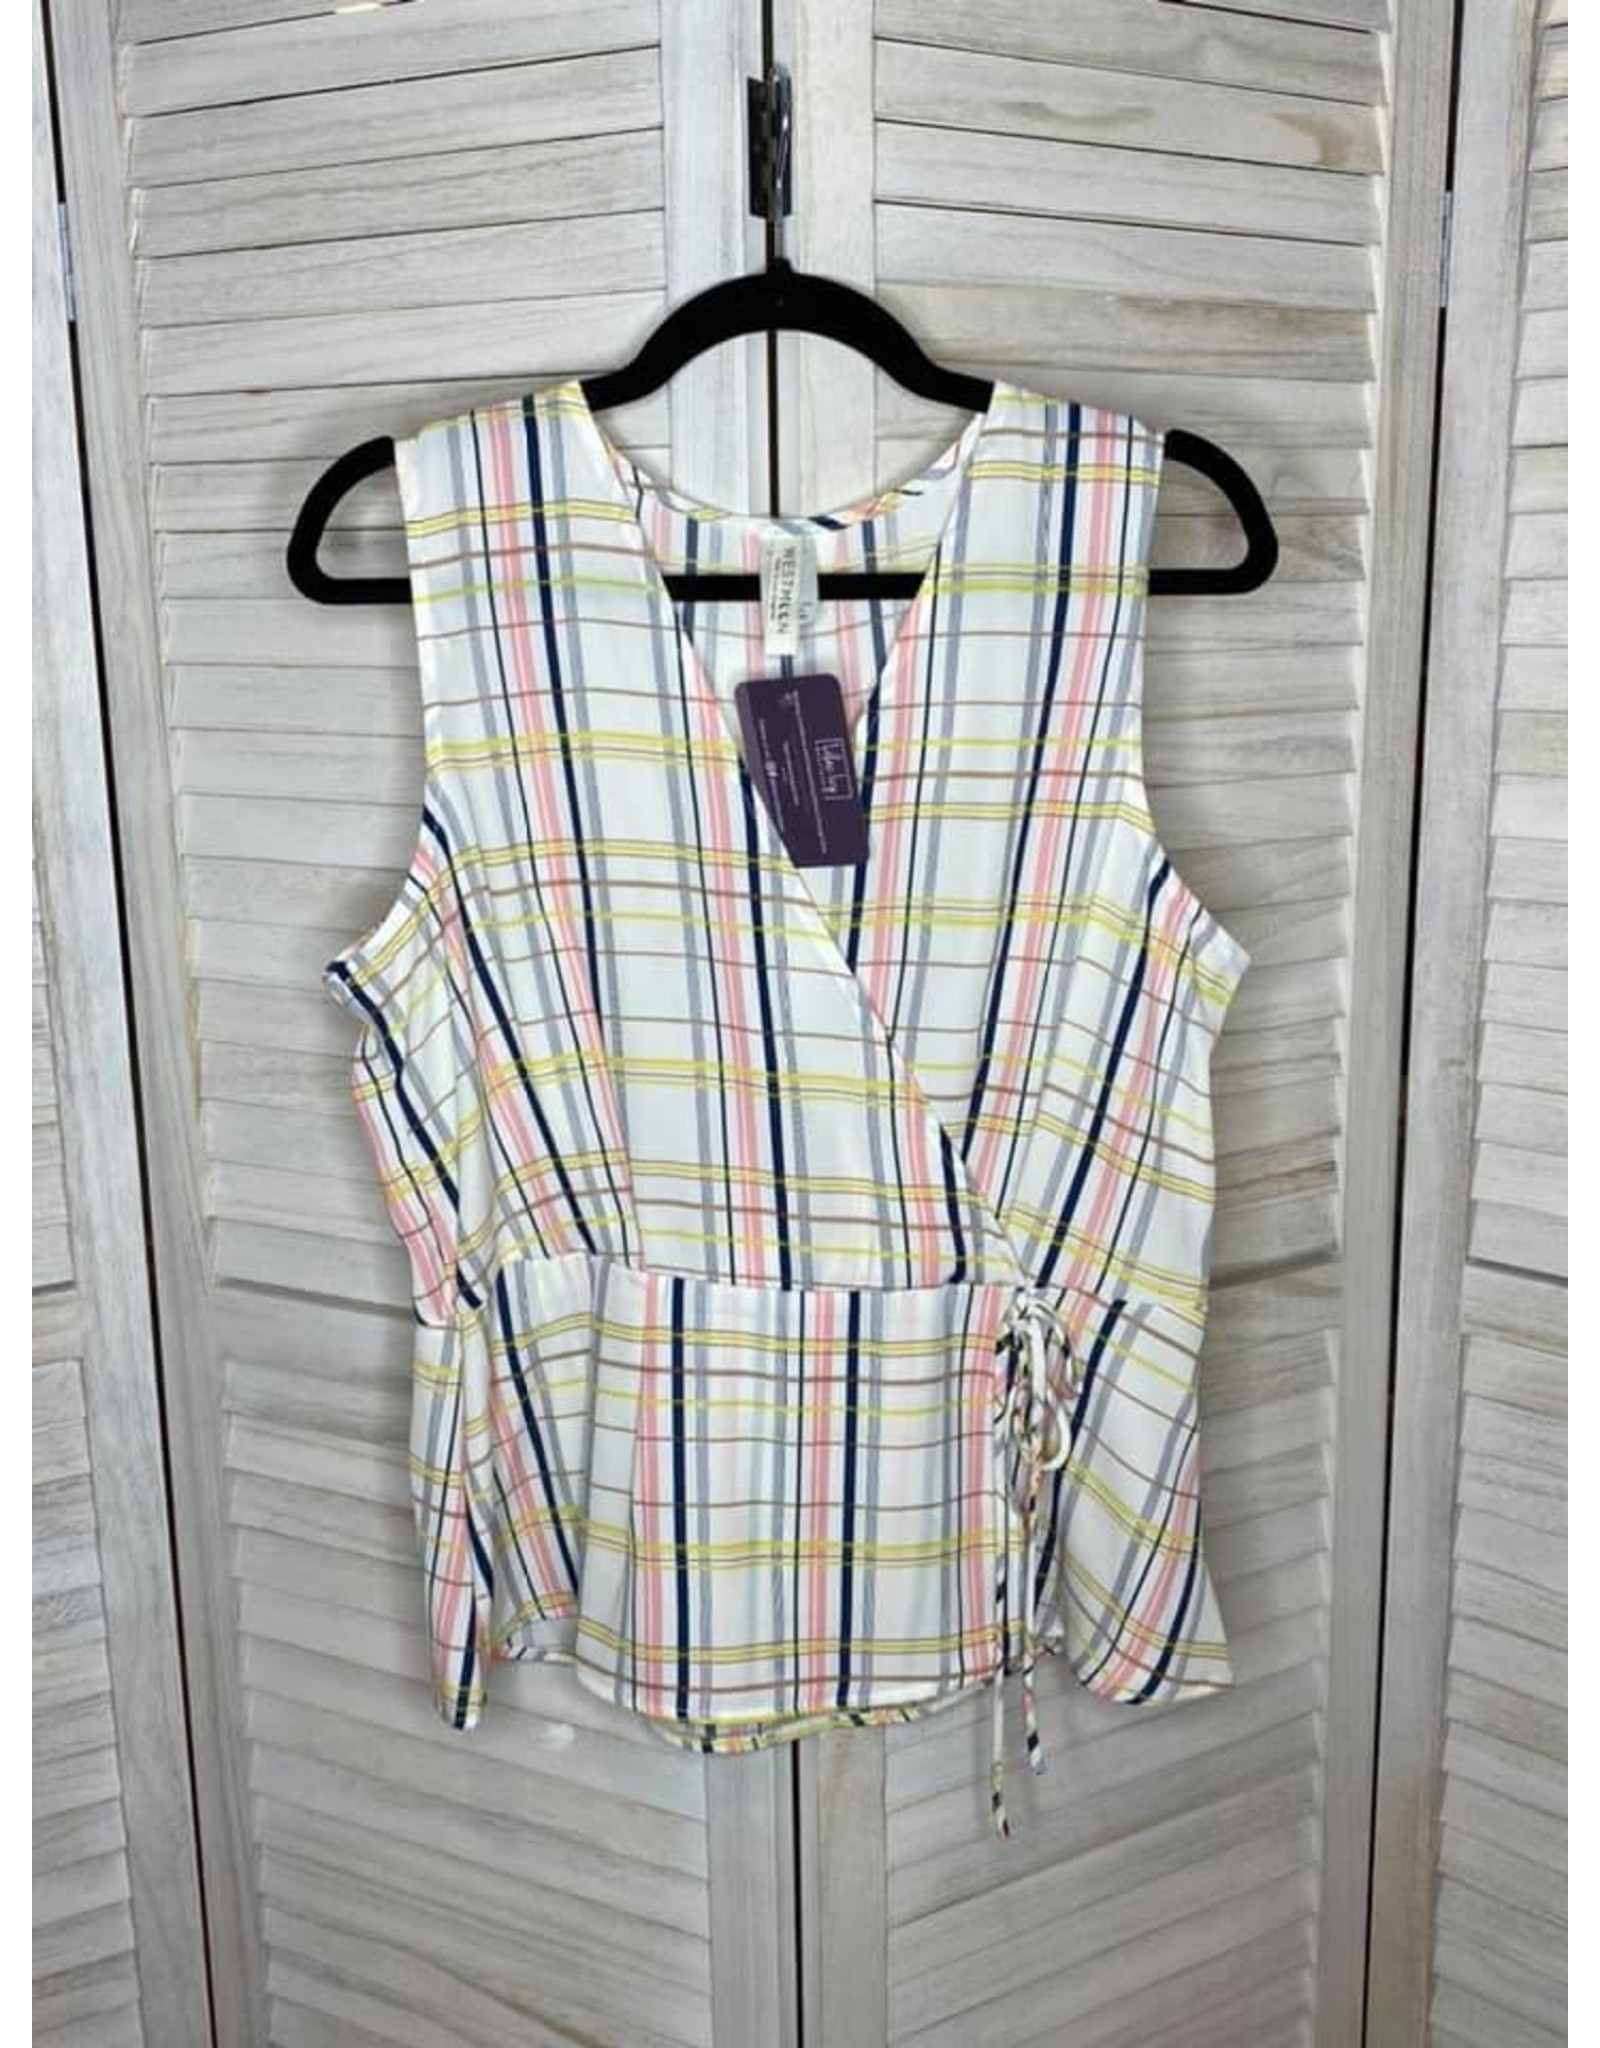 Westmoon Plaid Sleeveless Peplum Top with Tie